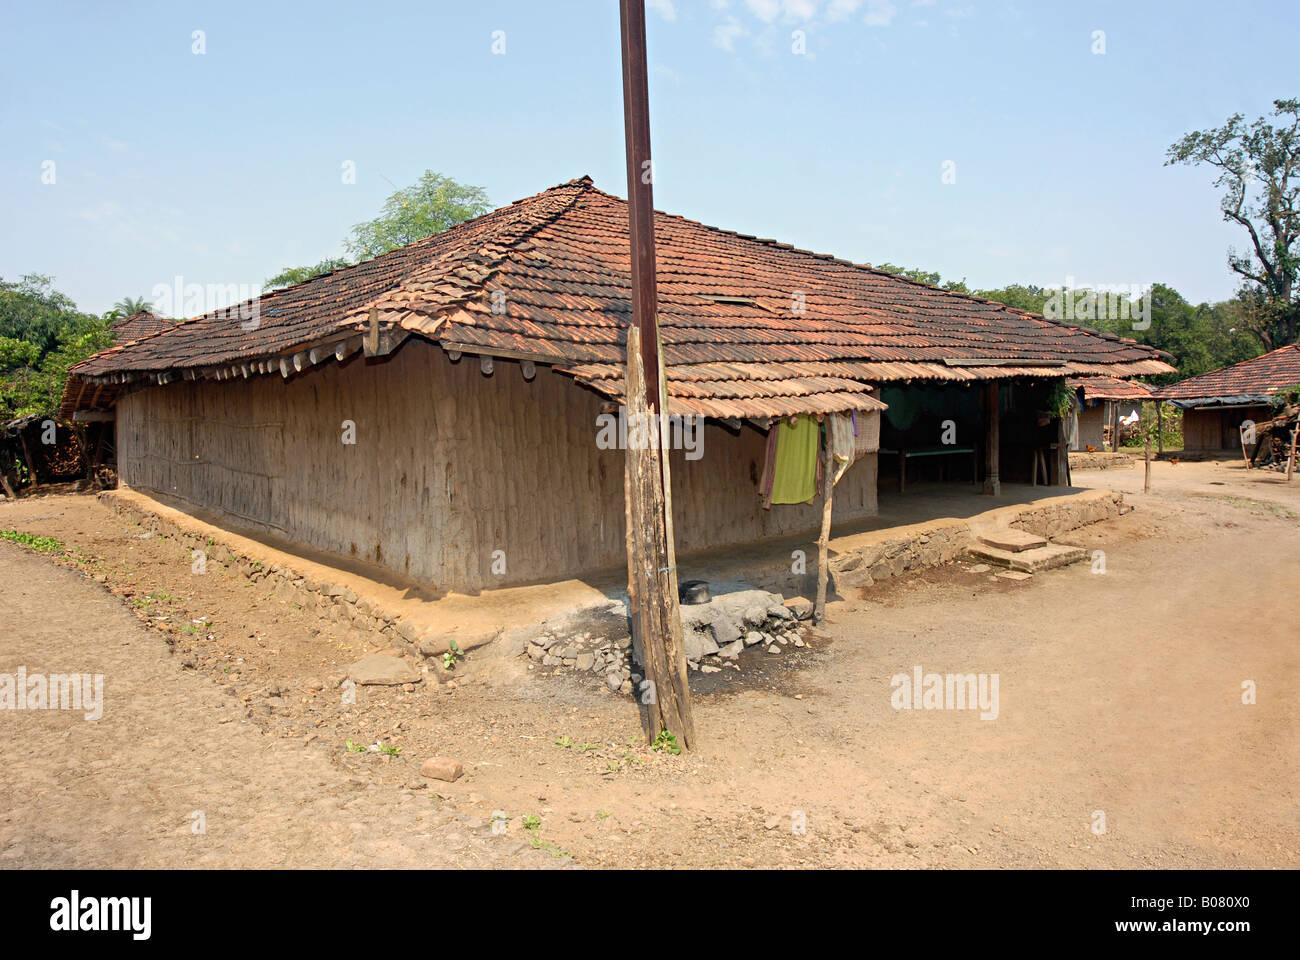 A typical tribal house malhar koli tribe stock photo for Tribal house